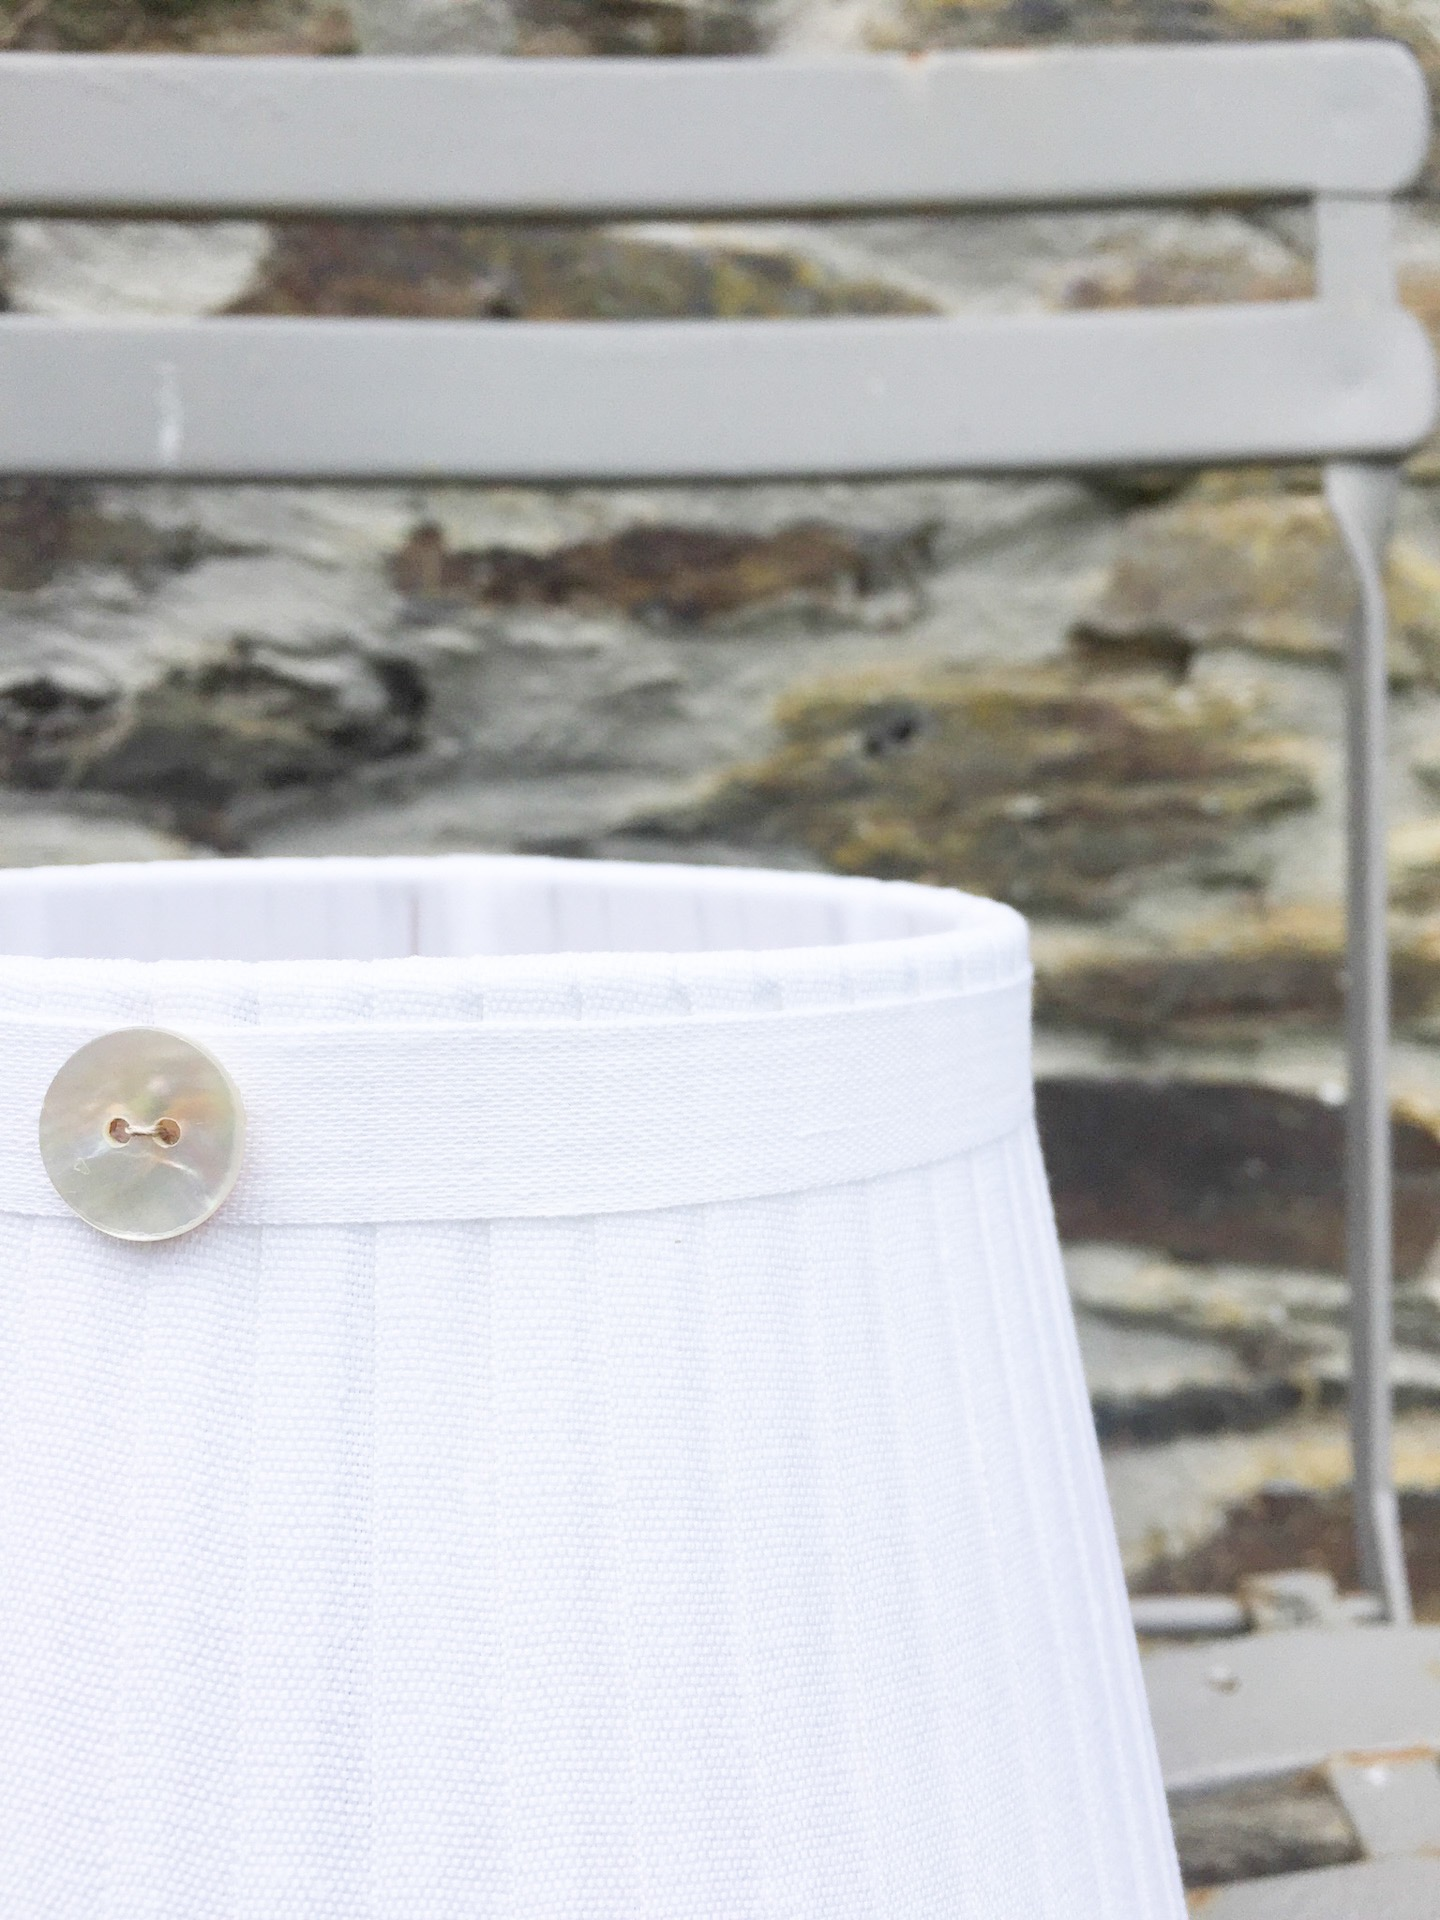 Grace whisper white linen mother of pearl button. www.bay-design.co.uk